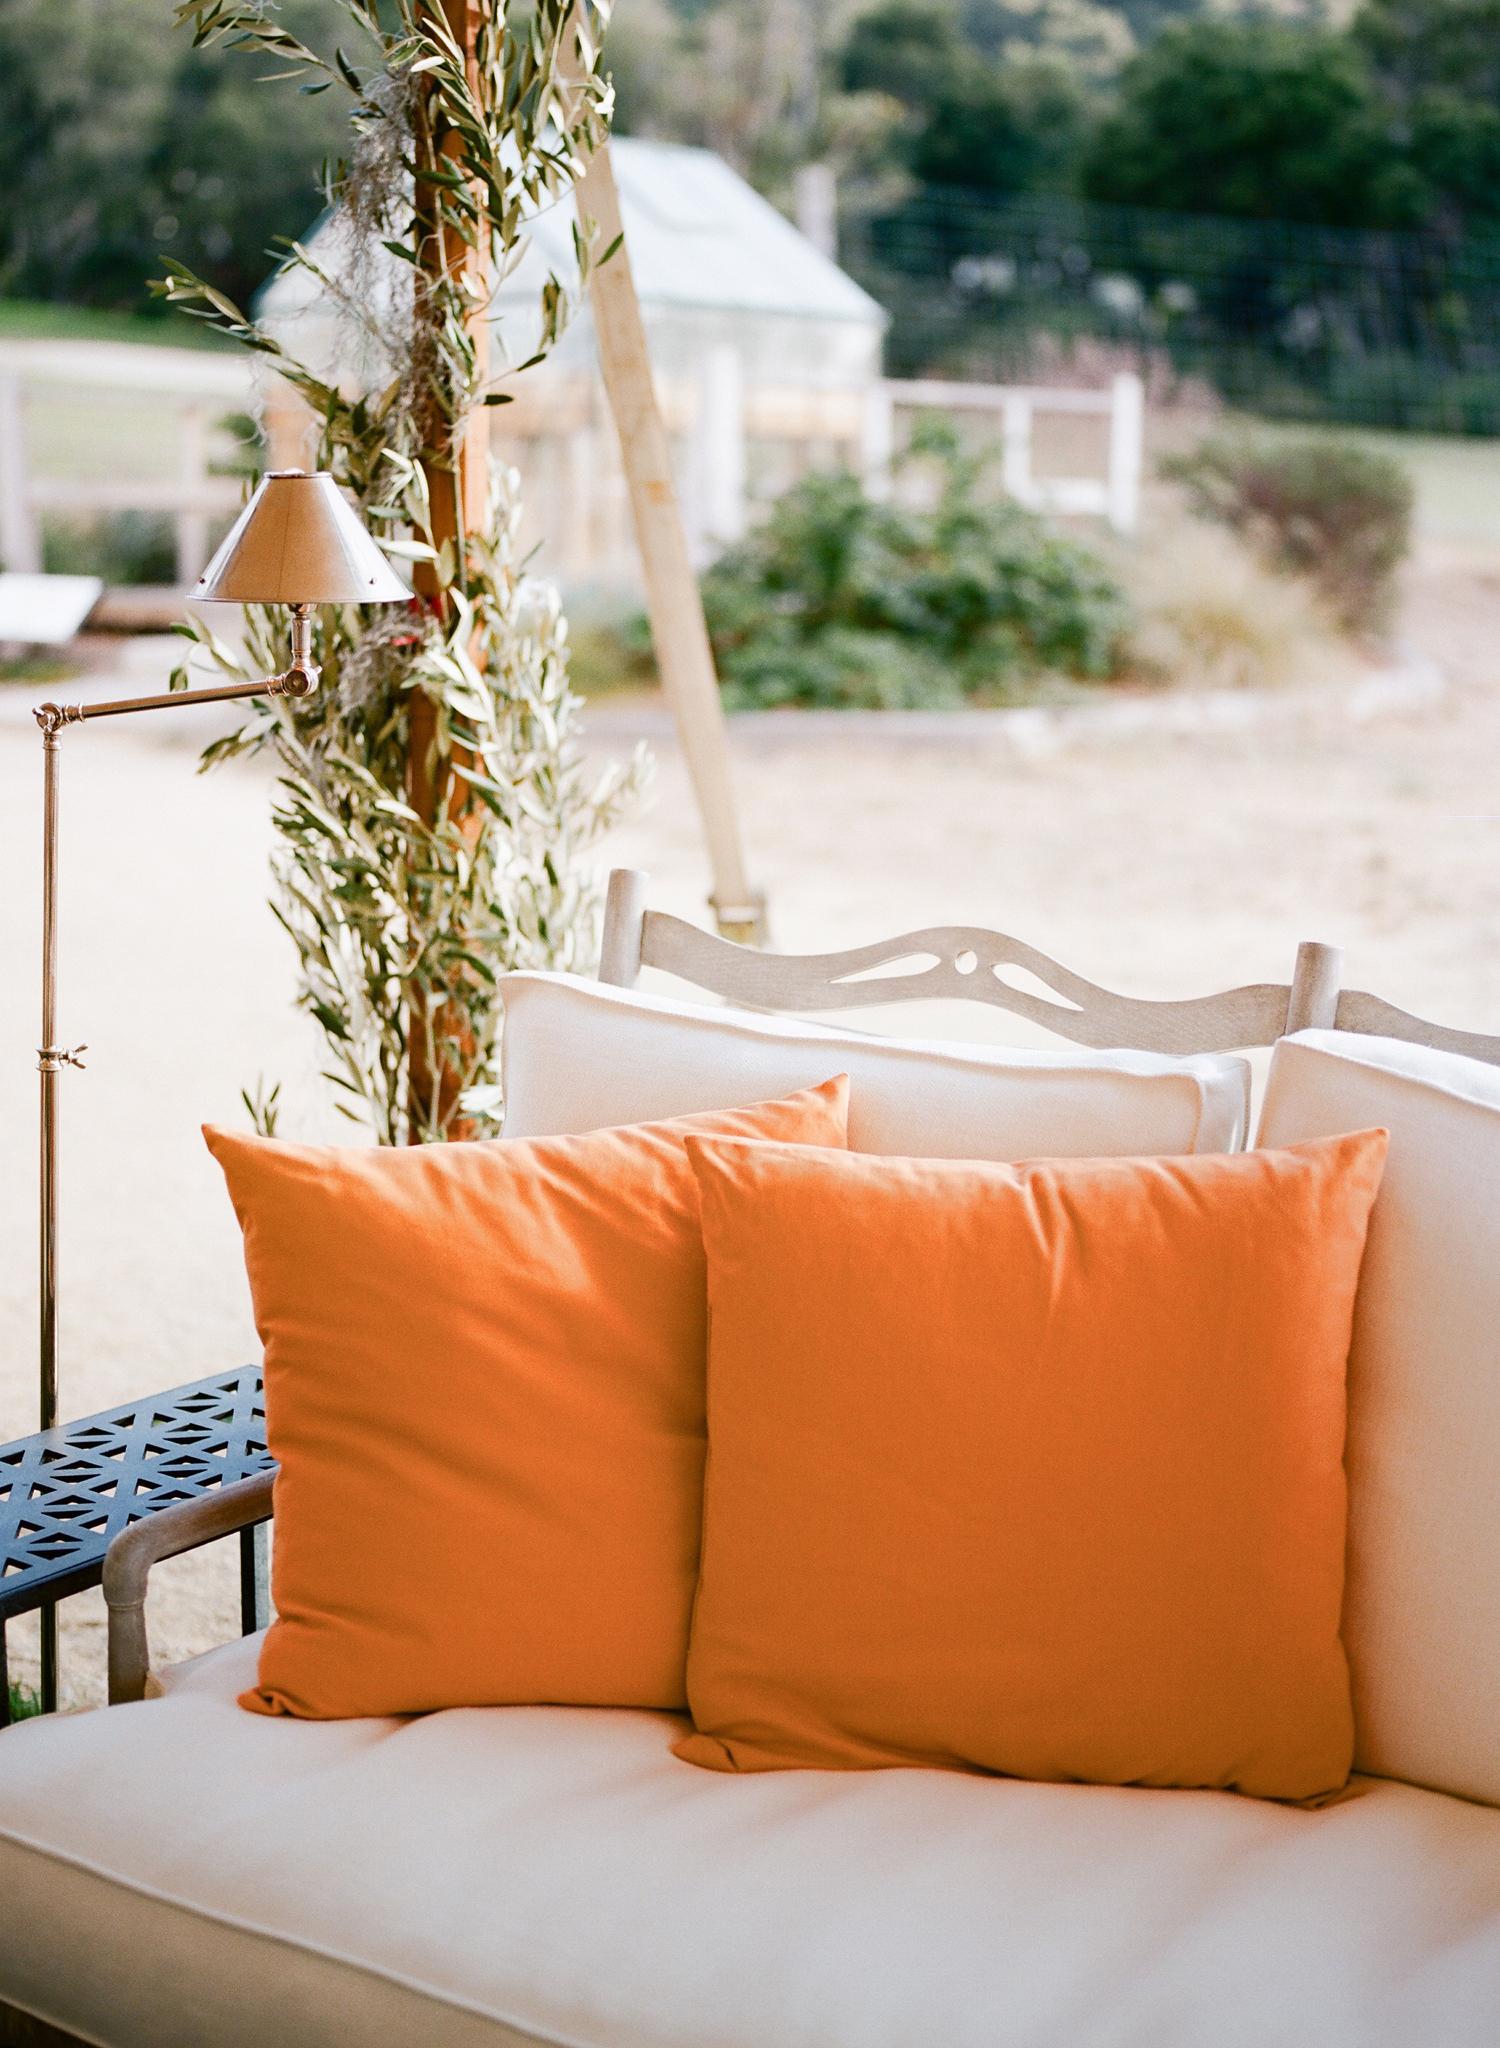 27-orange-pillows.jpg